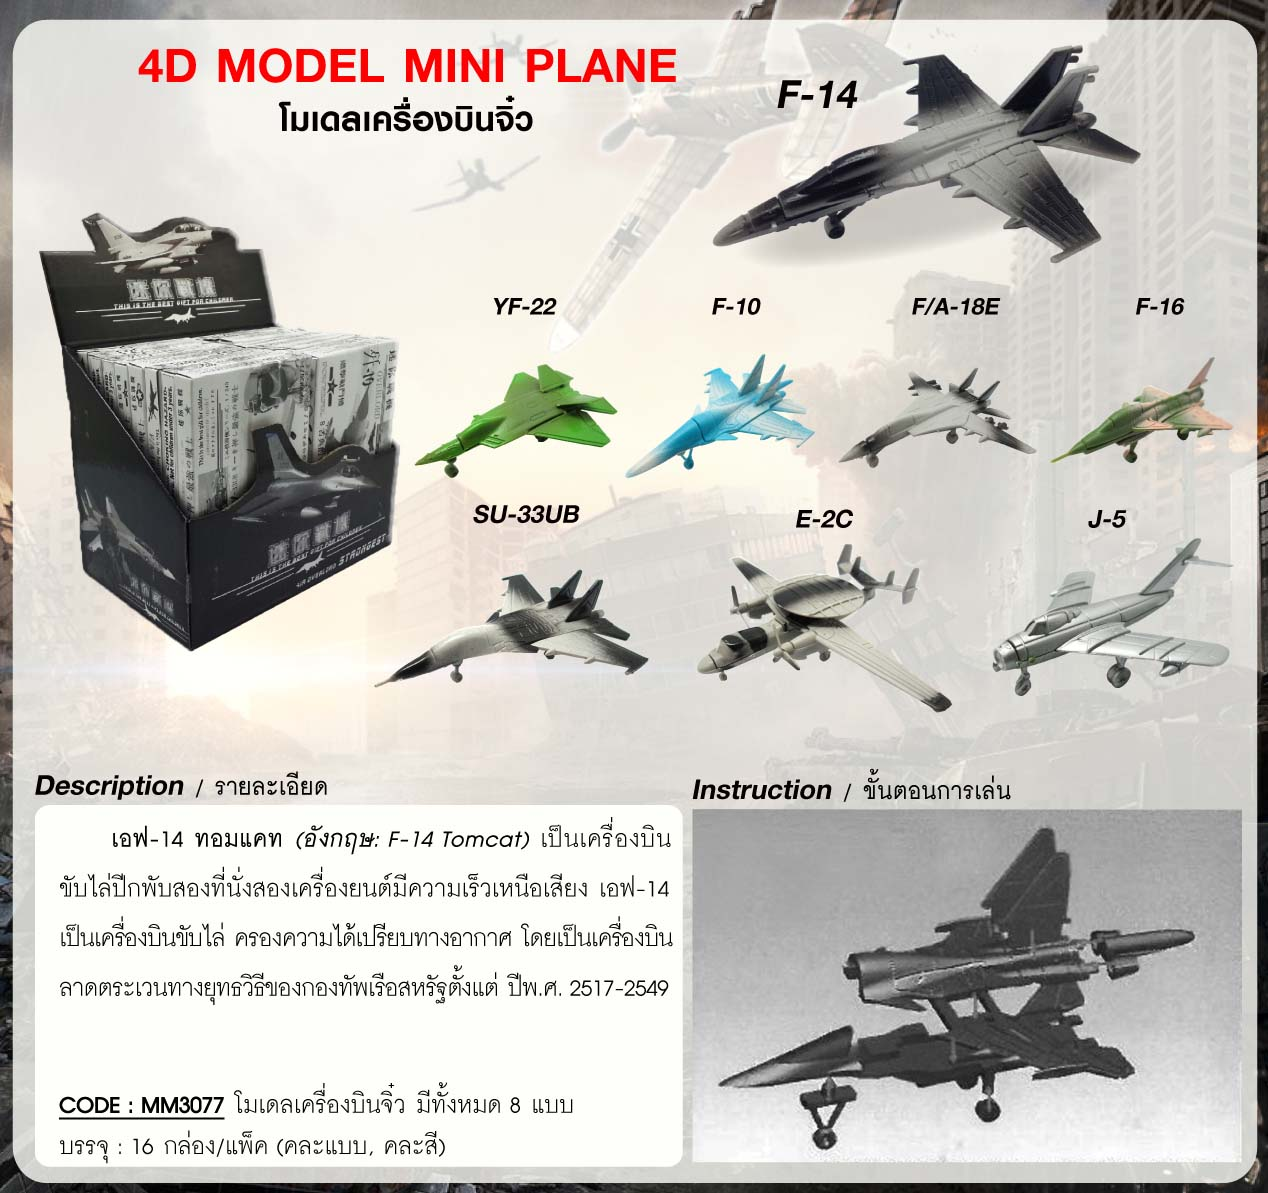 4D Model Mini Plane: โมเดลเครื่องบินจิ๋ว